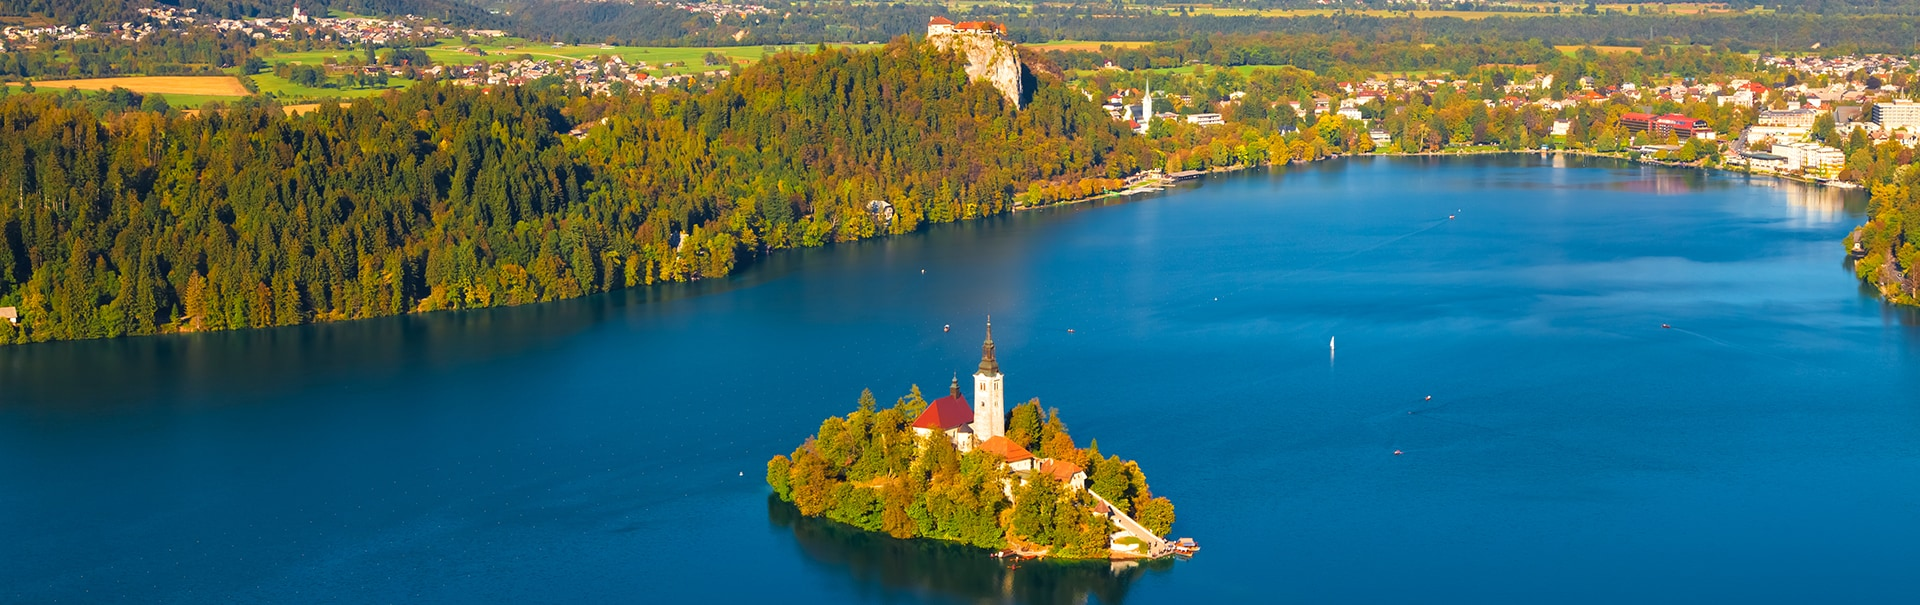 Discover Slovenia (SHSV1) Banner